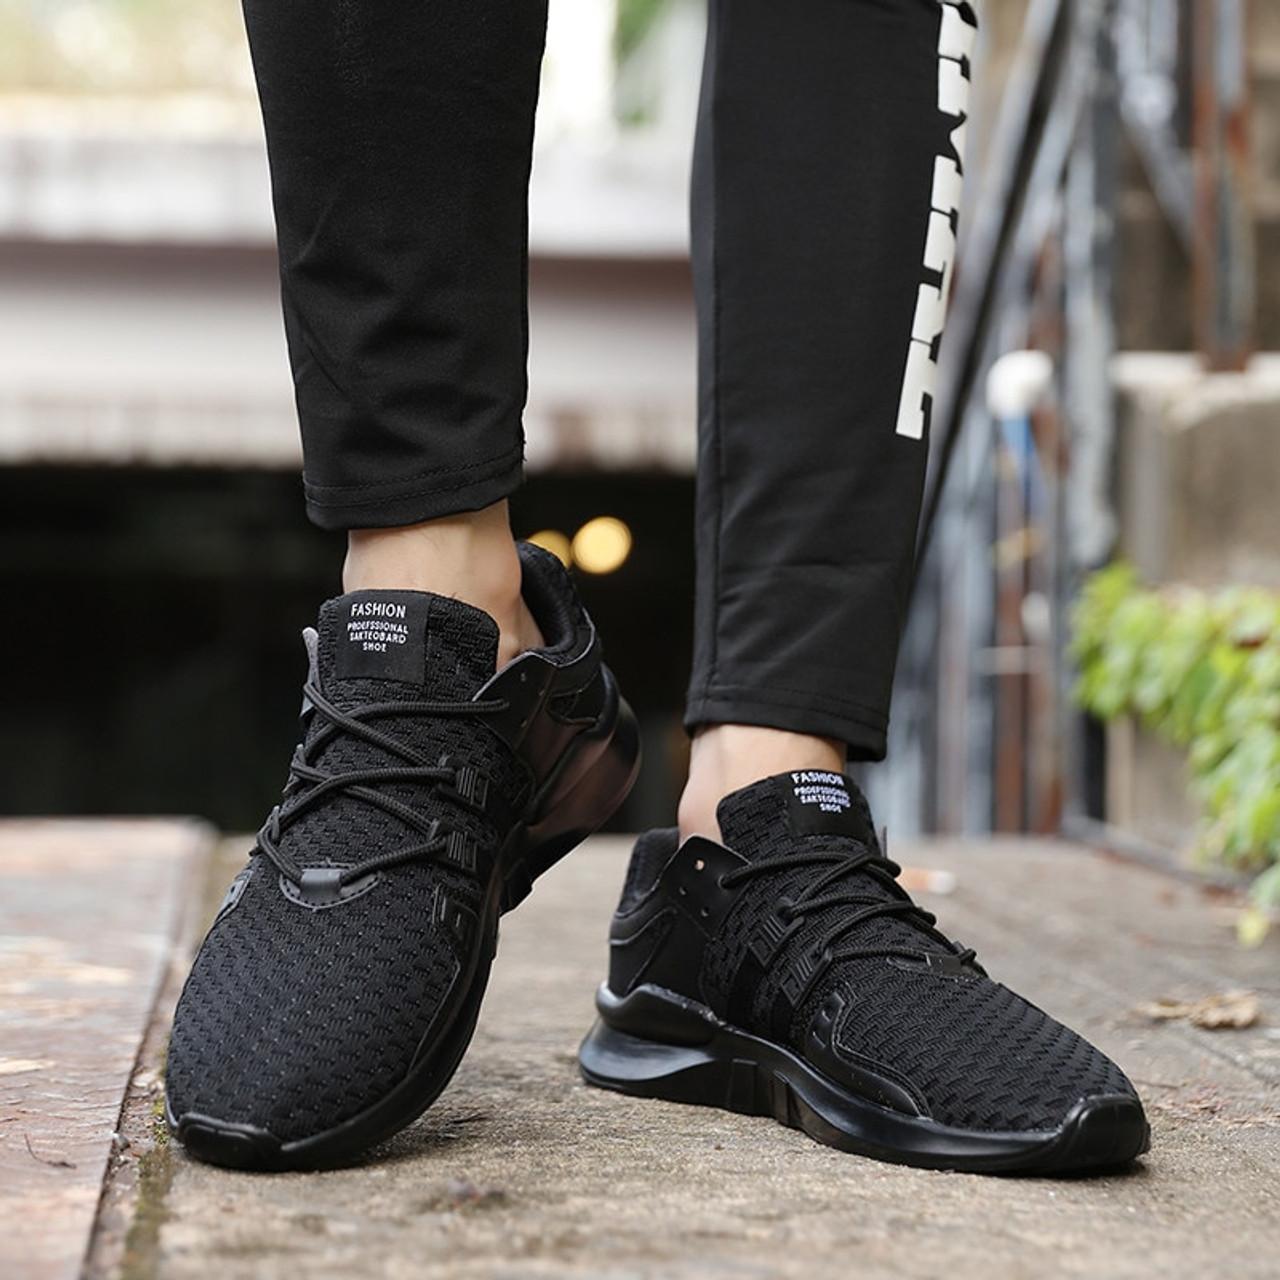 PINSV Summer Shoes Men Sneakers